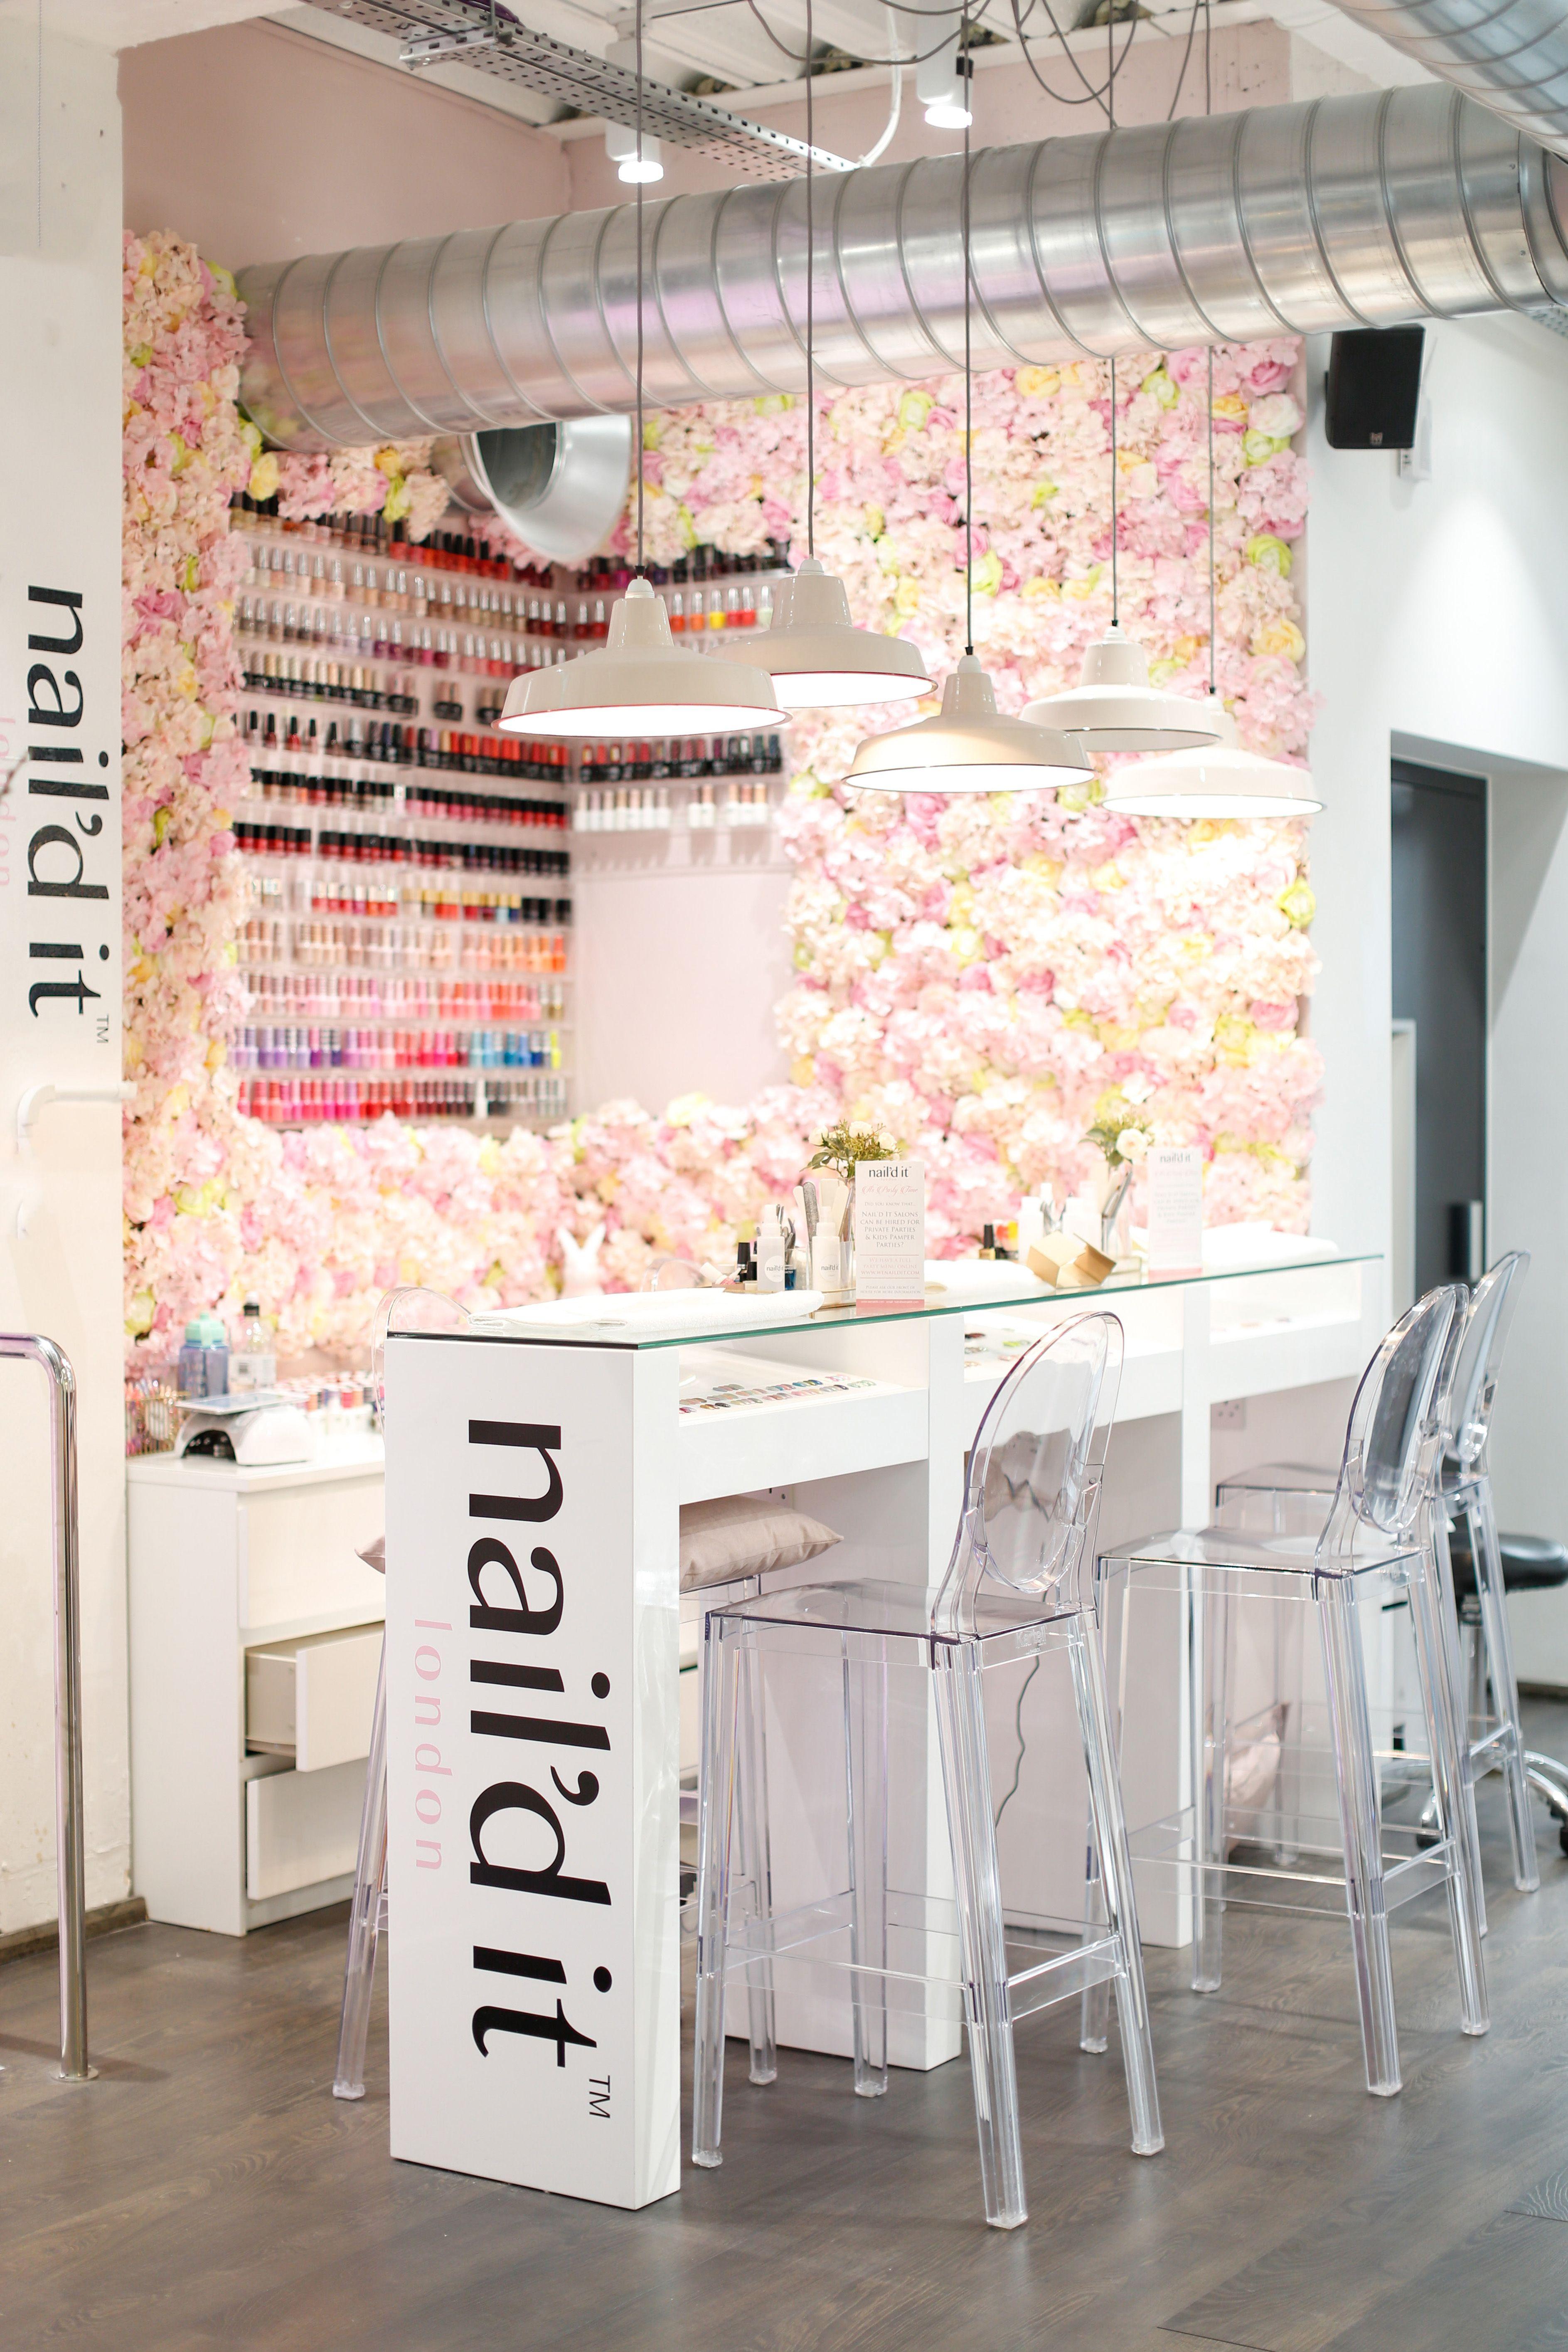 London city guide most instagrammable blow dry bar salon and spa layout ideas bar negozio - Bar salon design ...